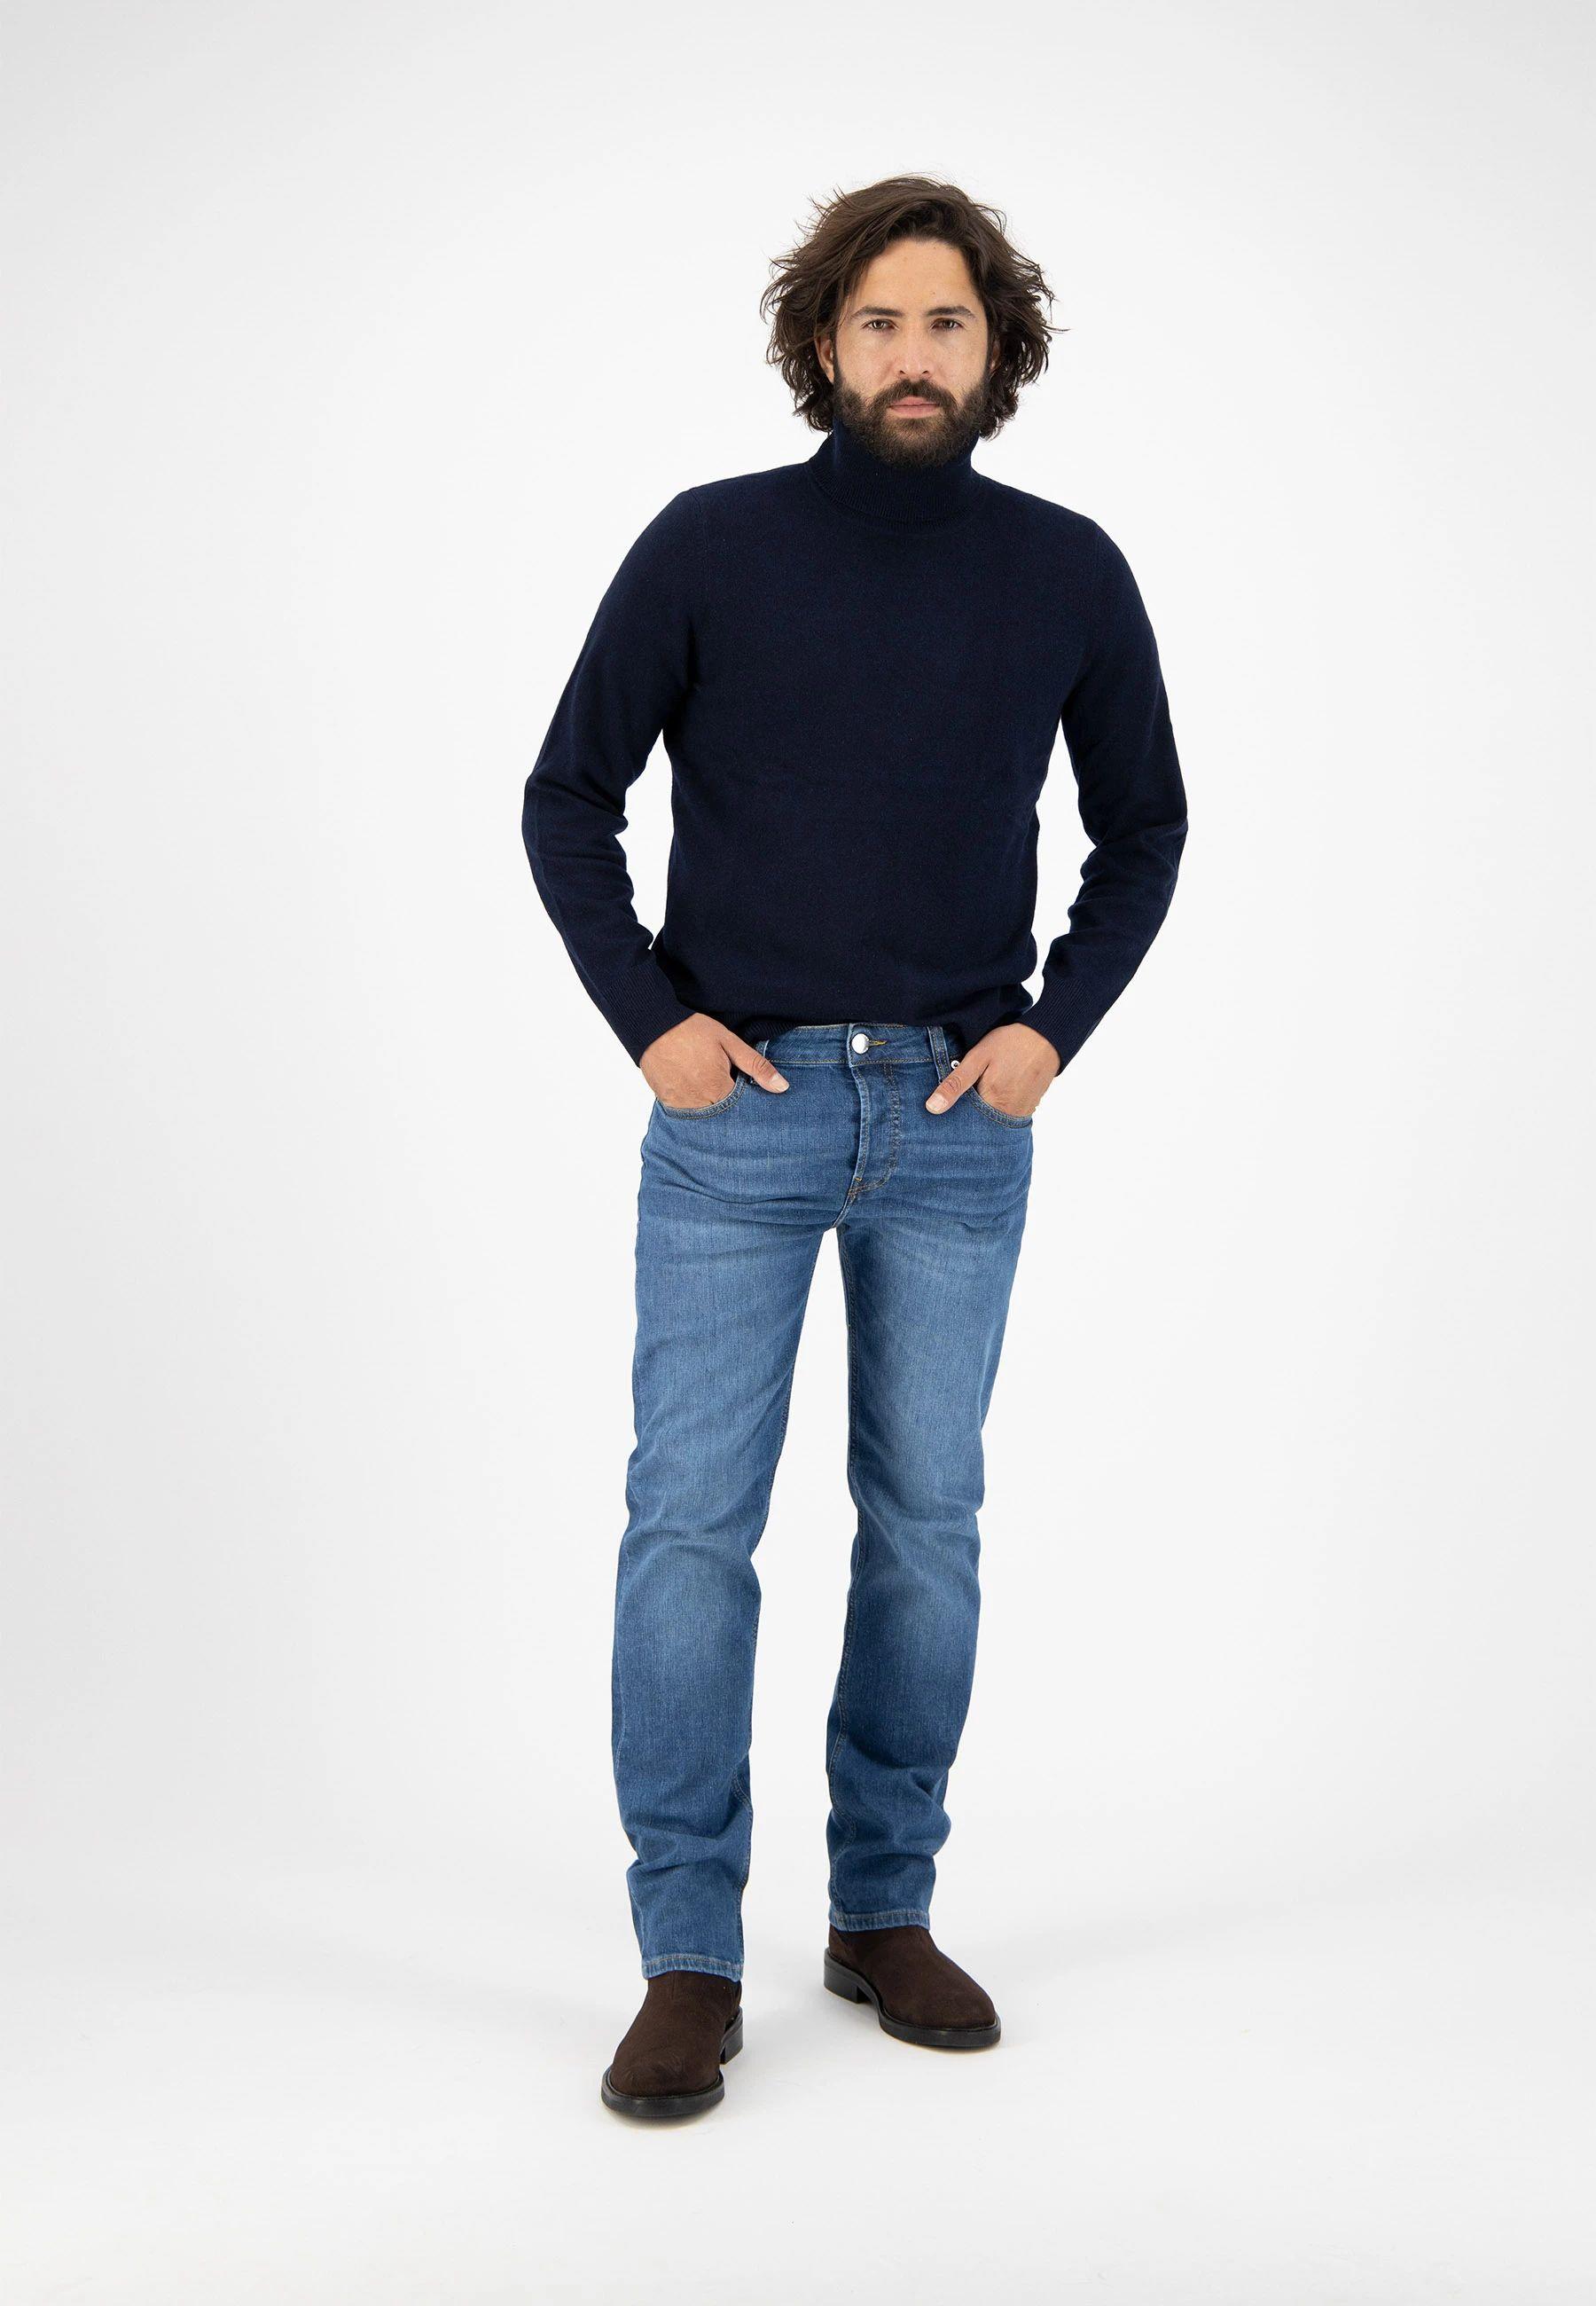 Men-Ethical-Jeans-Regular-Bryce-Authentic-Indigo-Fullfront-1_2000x